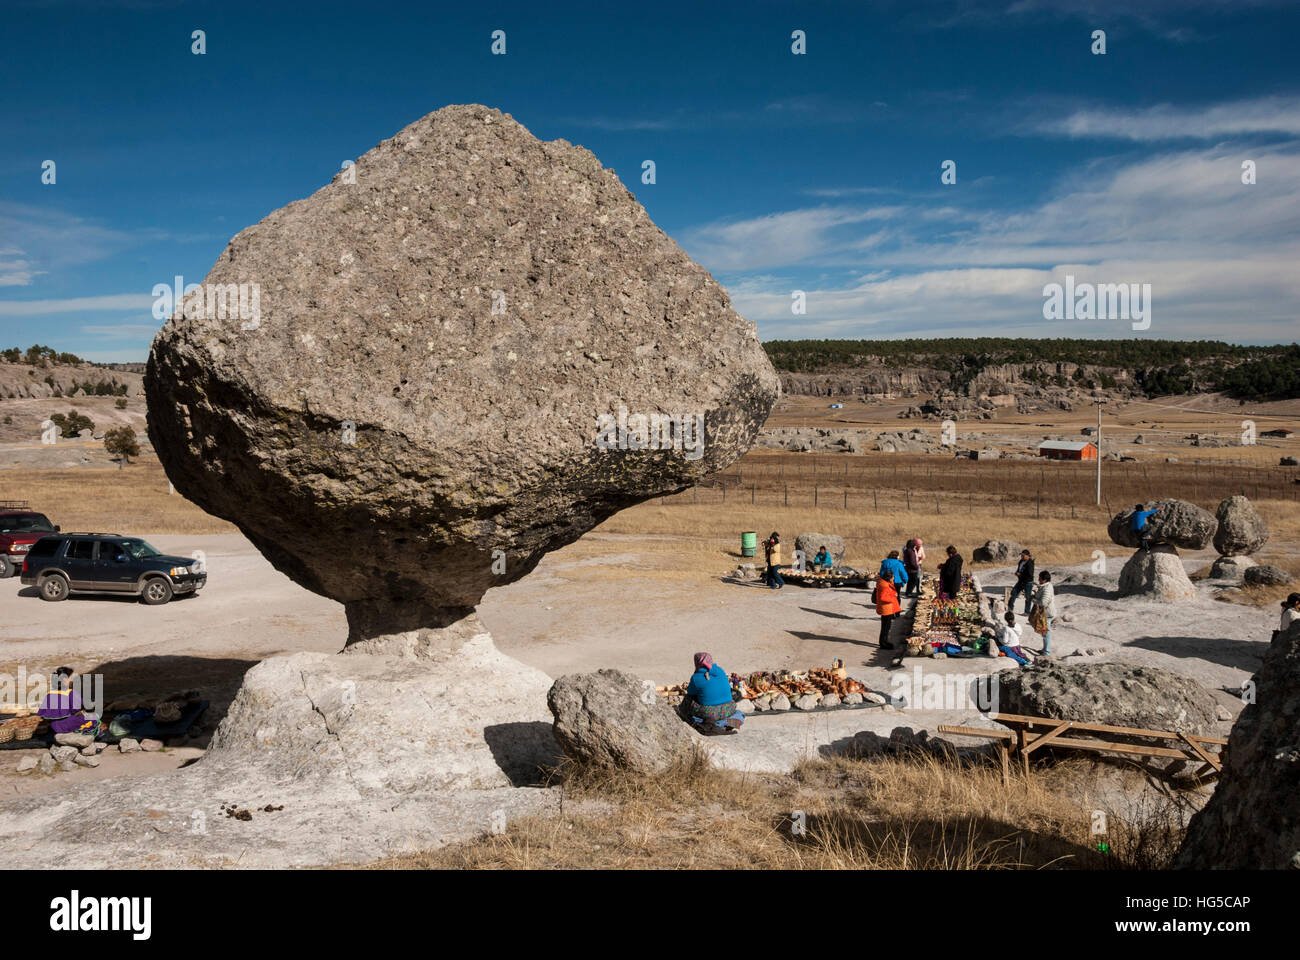 Valle de los Hongos (Mushroom Rocks) formed of volcanic ash, Creel, Chihuahua, Mexico, North America - Stock Image